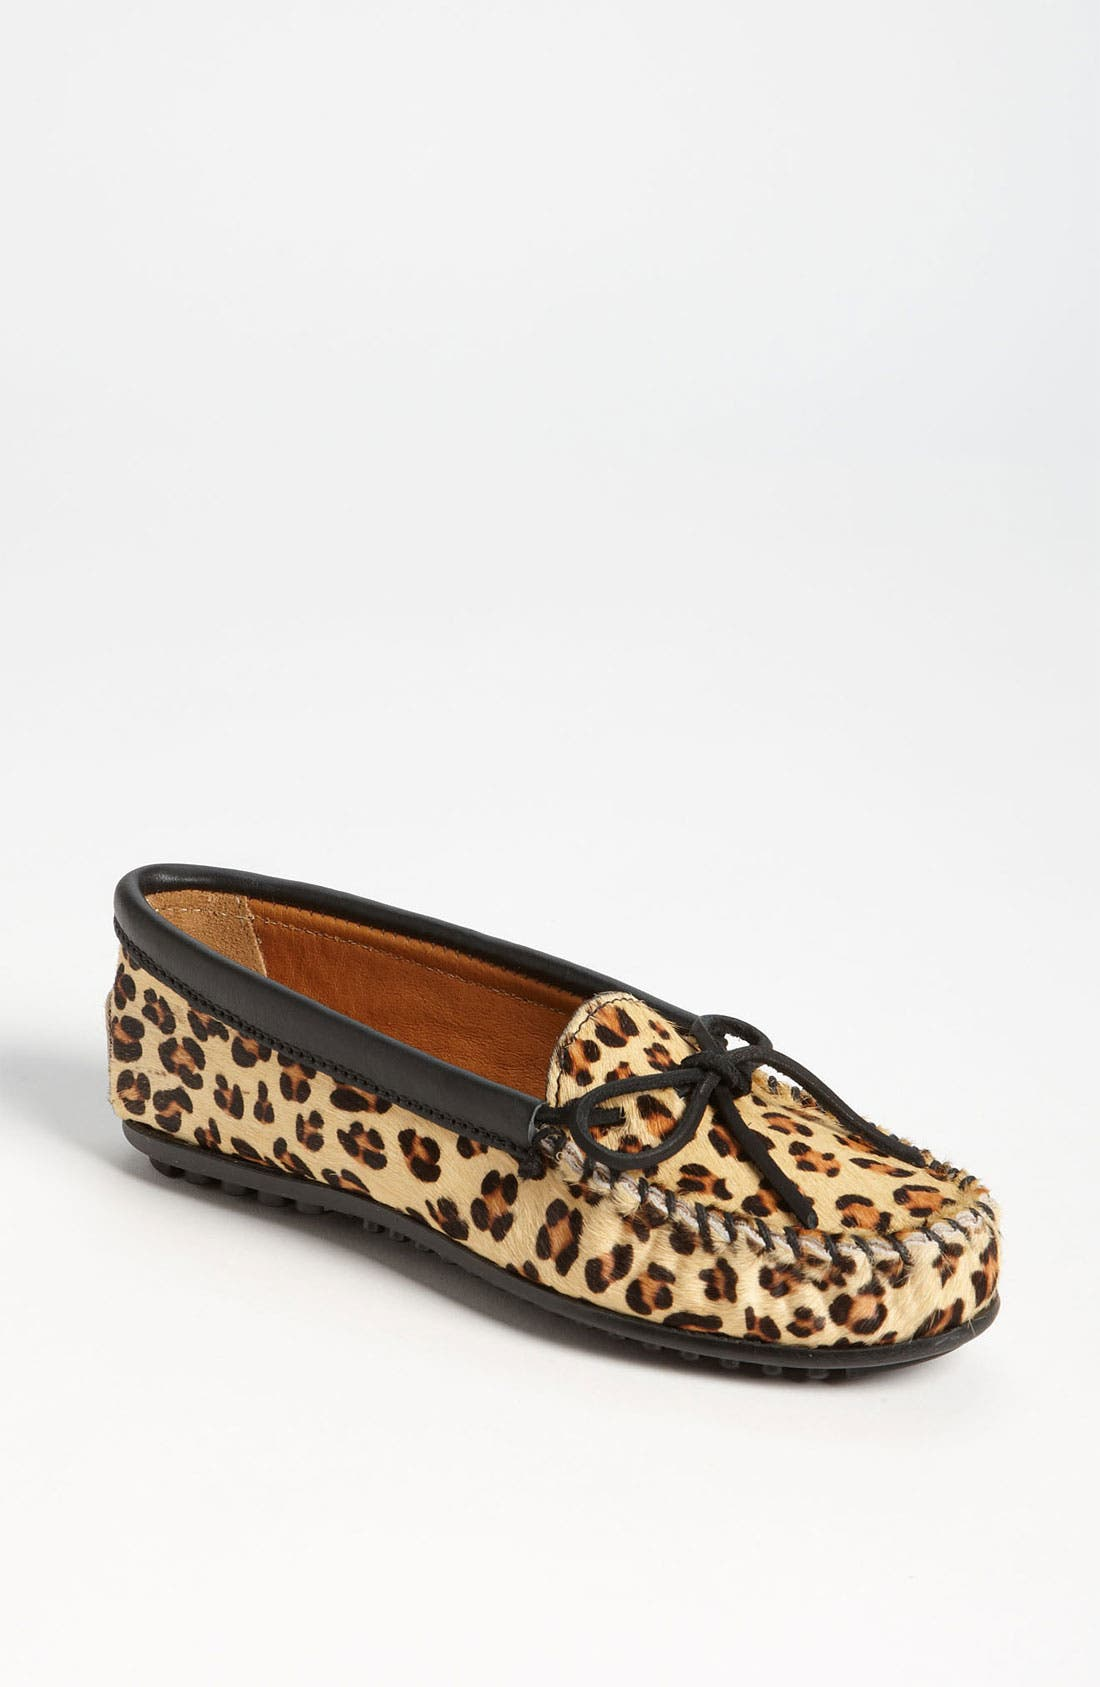 Main Image - Minnetonka 'Full Leopard' Moccasin